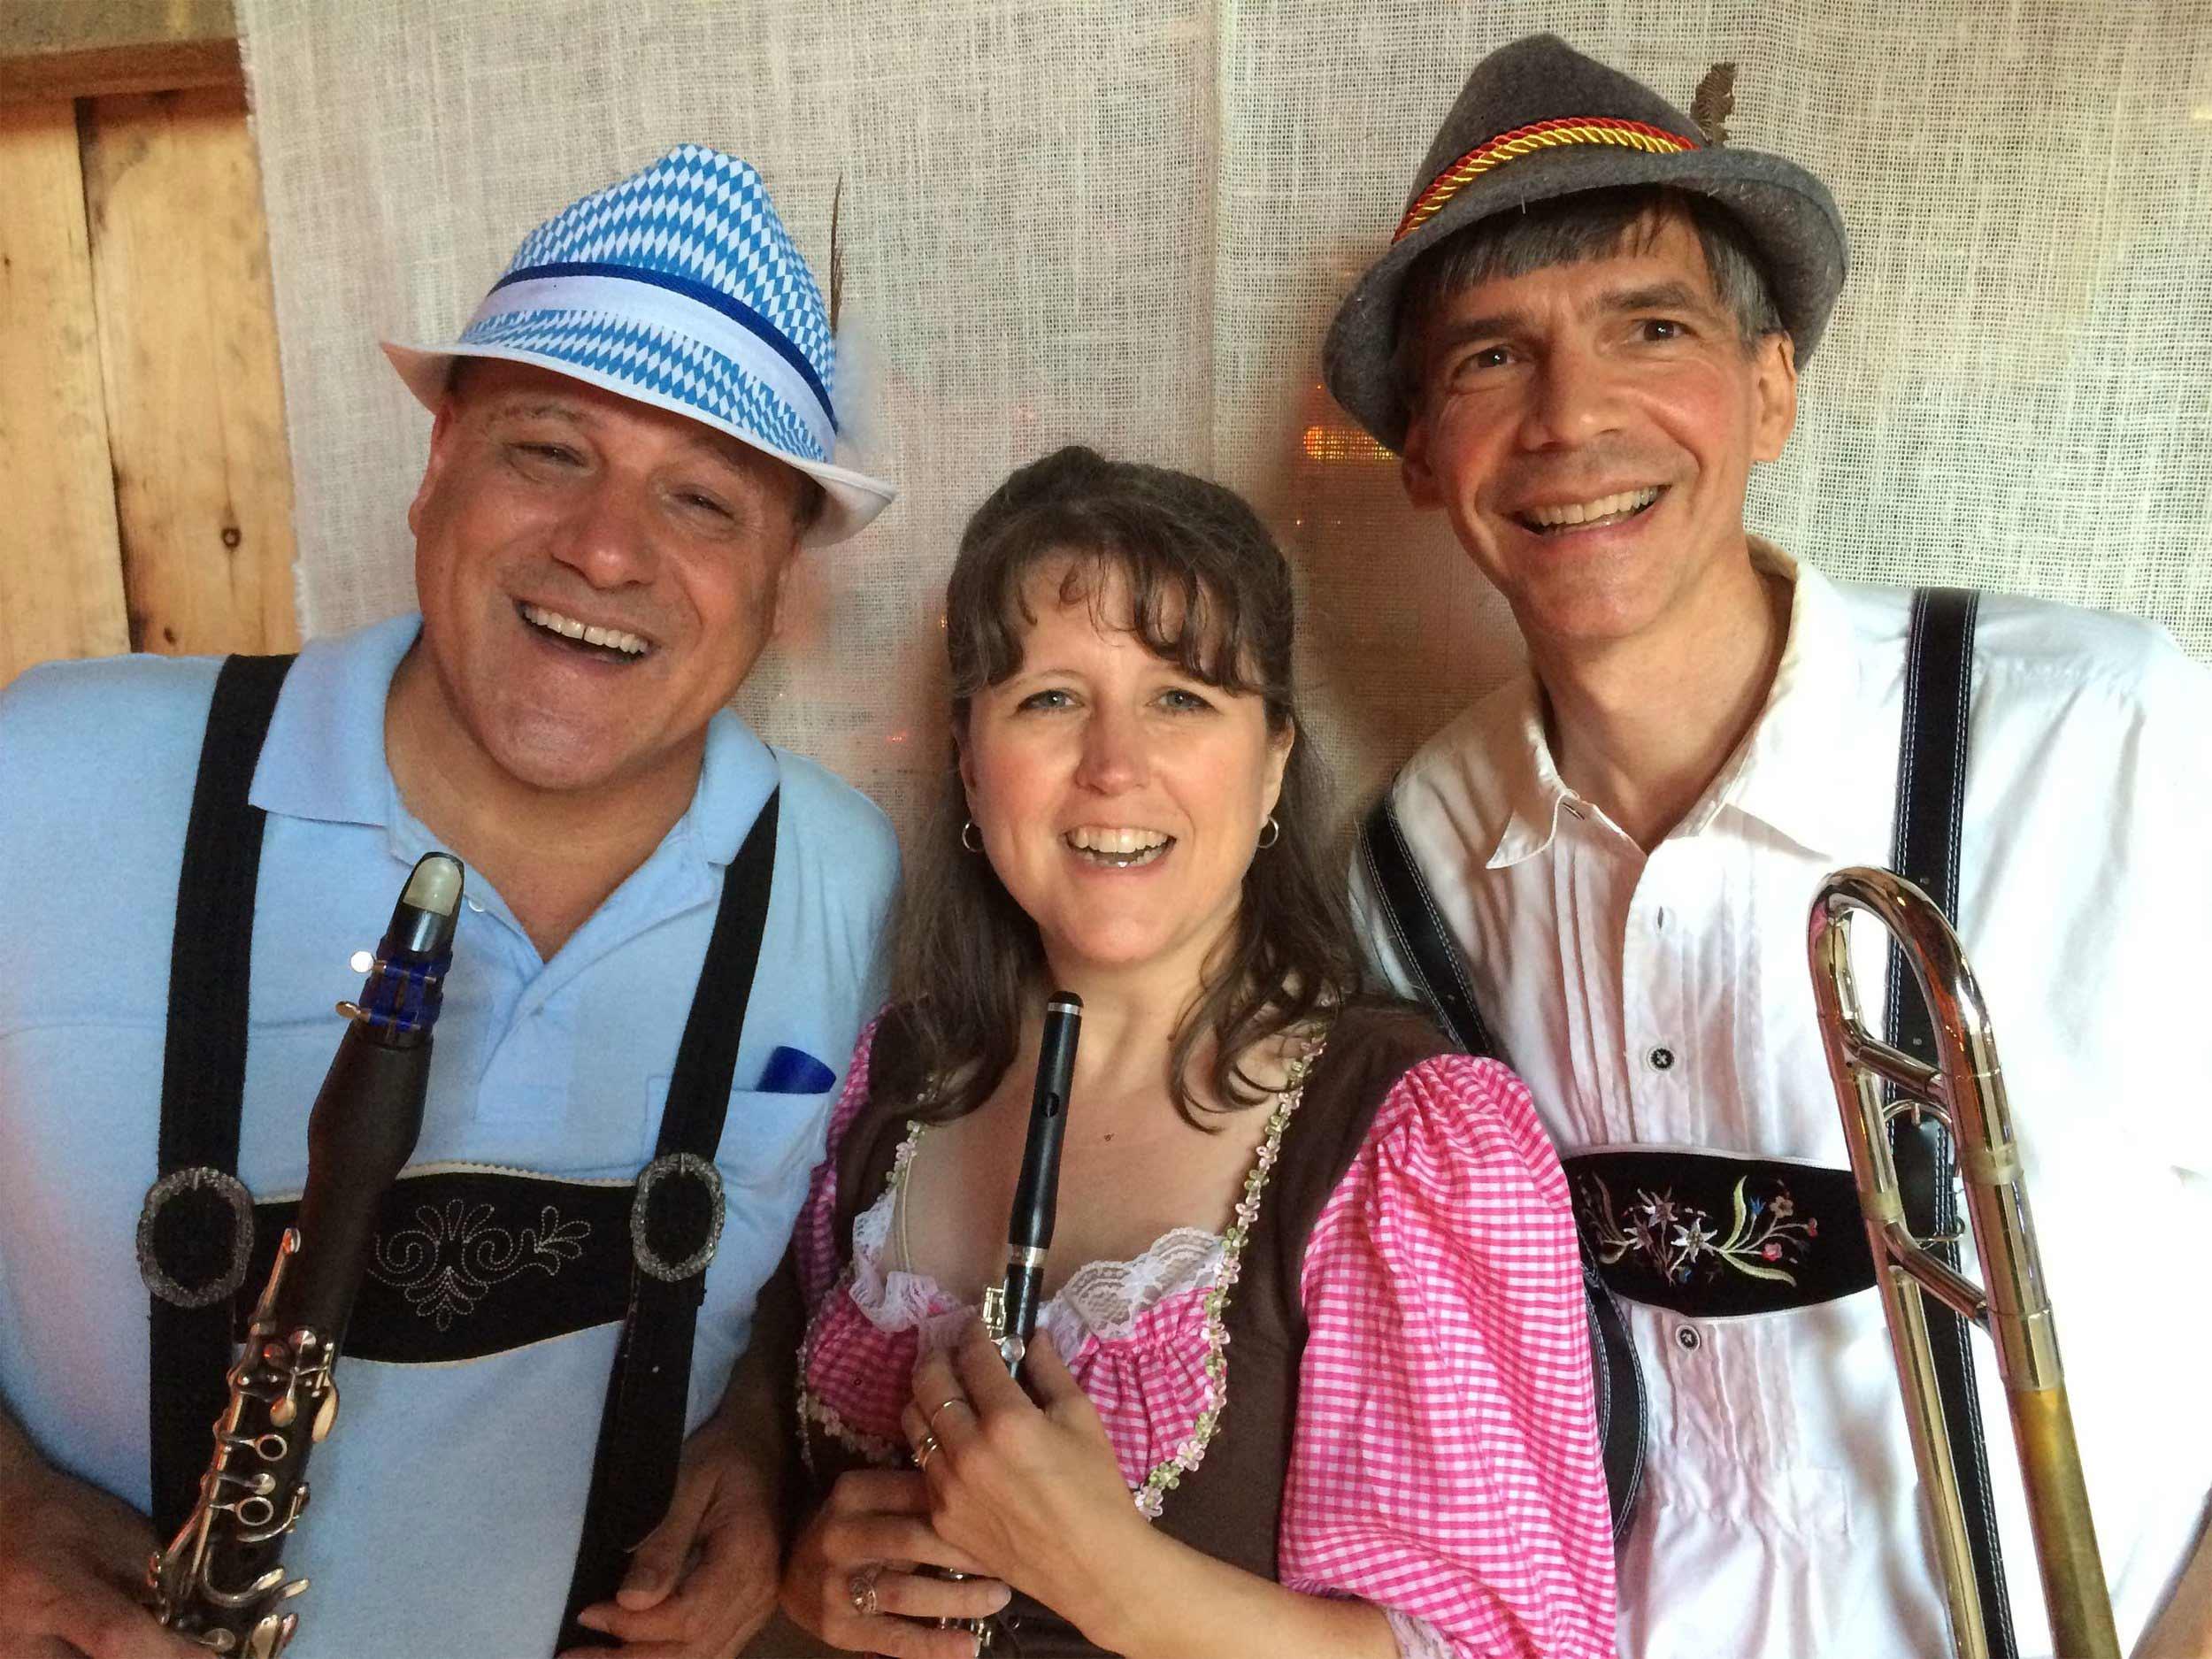 Oom-Pa-pa-ban-lederhosen-70th-birthday-party-in-berkshires-ma-with-harrington-events.jpg